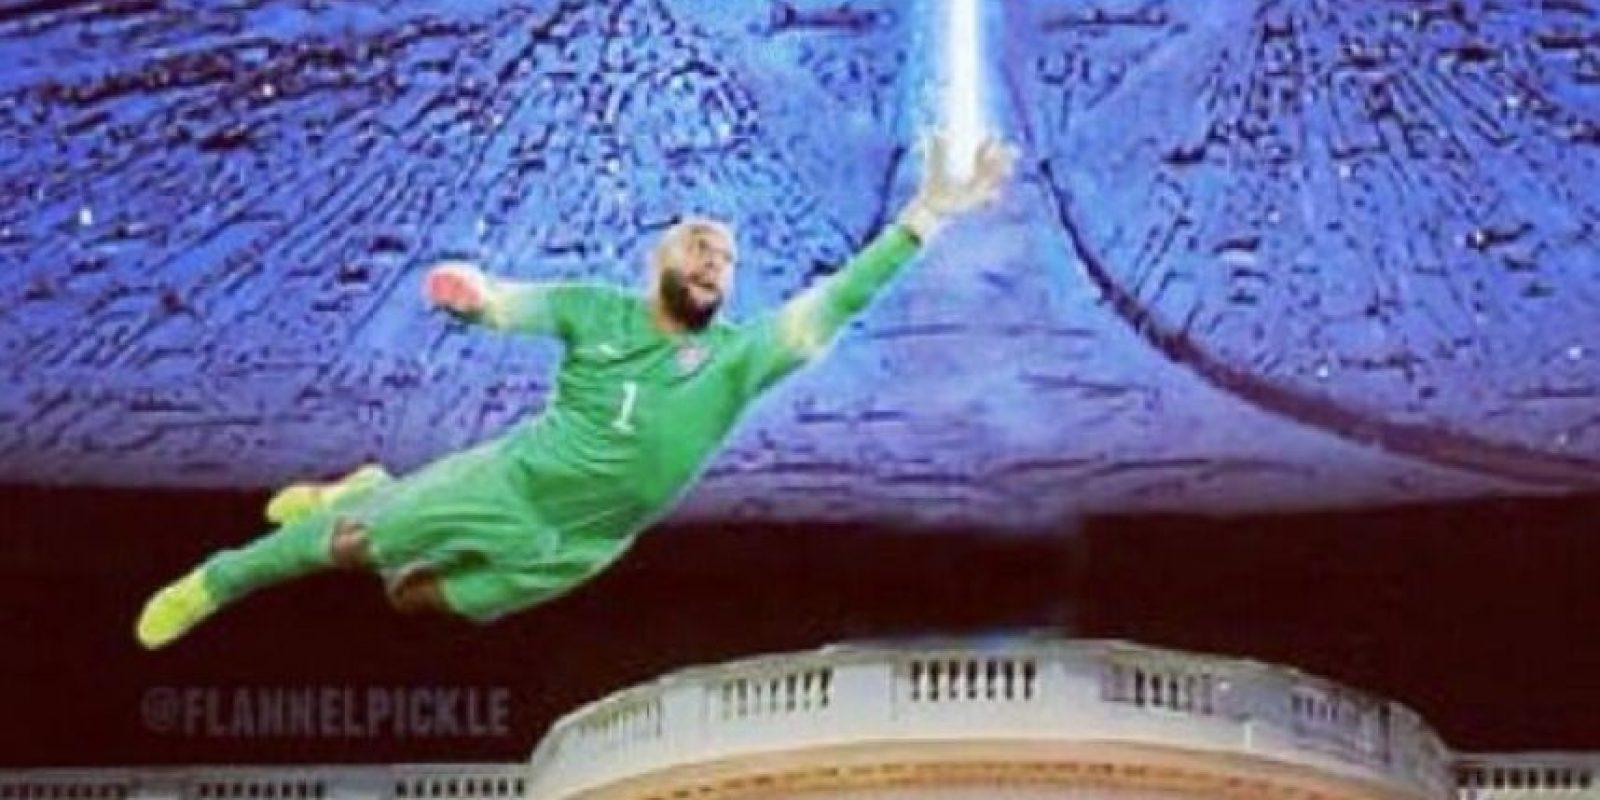 Las atajadas del estadounidense Tim Howard provacaron muchos memes Foto:Twitter